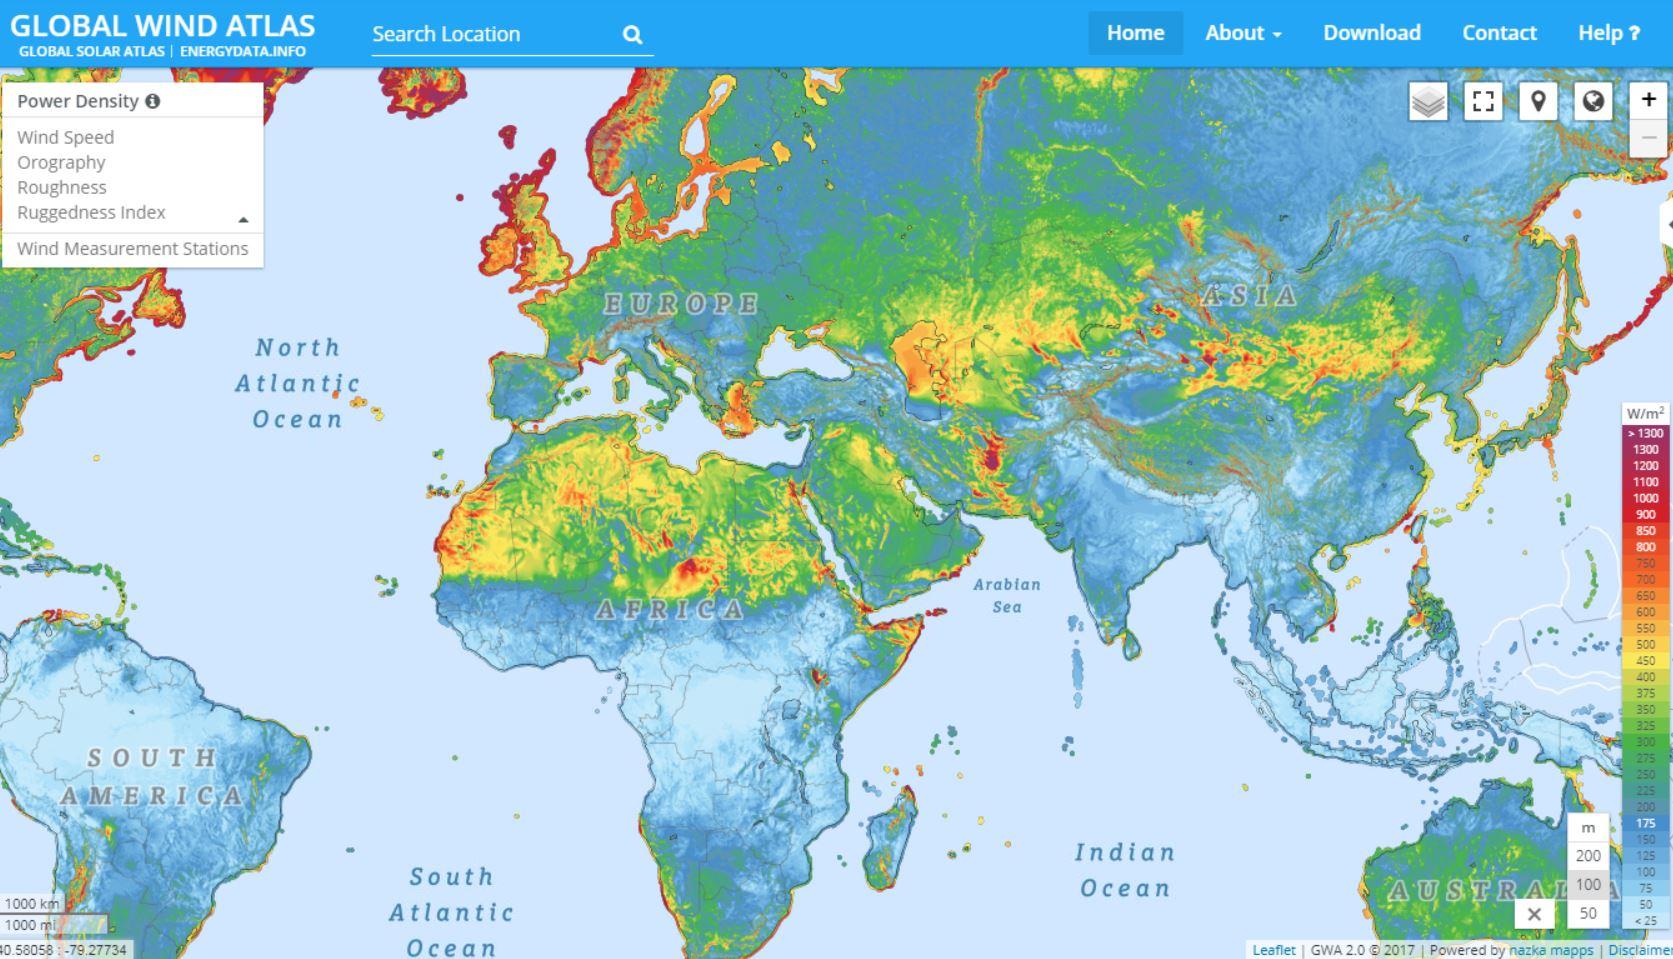 Global wind atlas wasp global wind atlas gumiabroncs Images